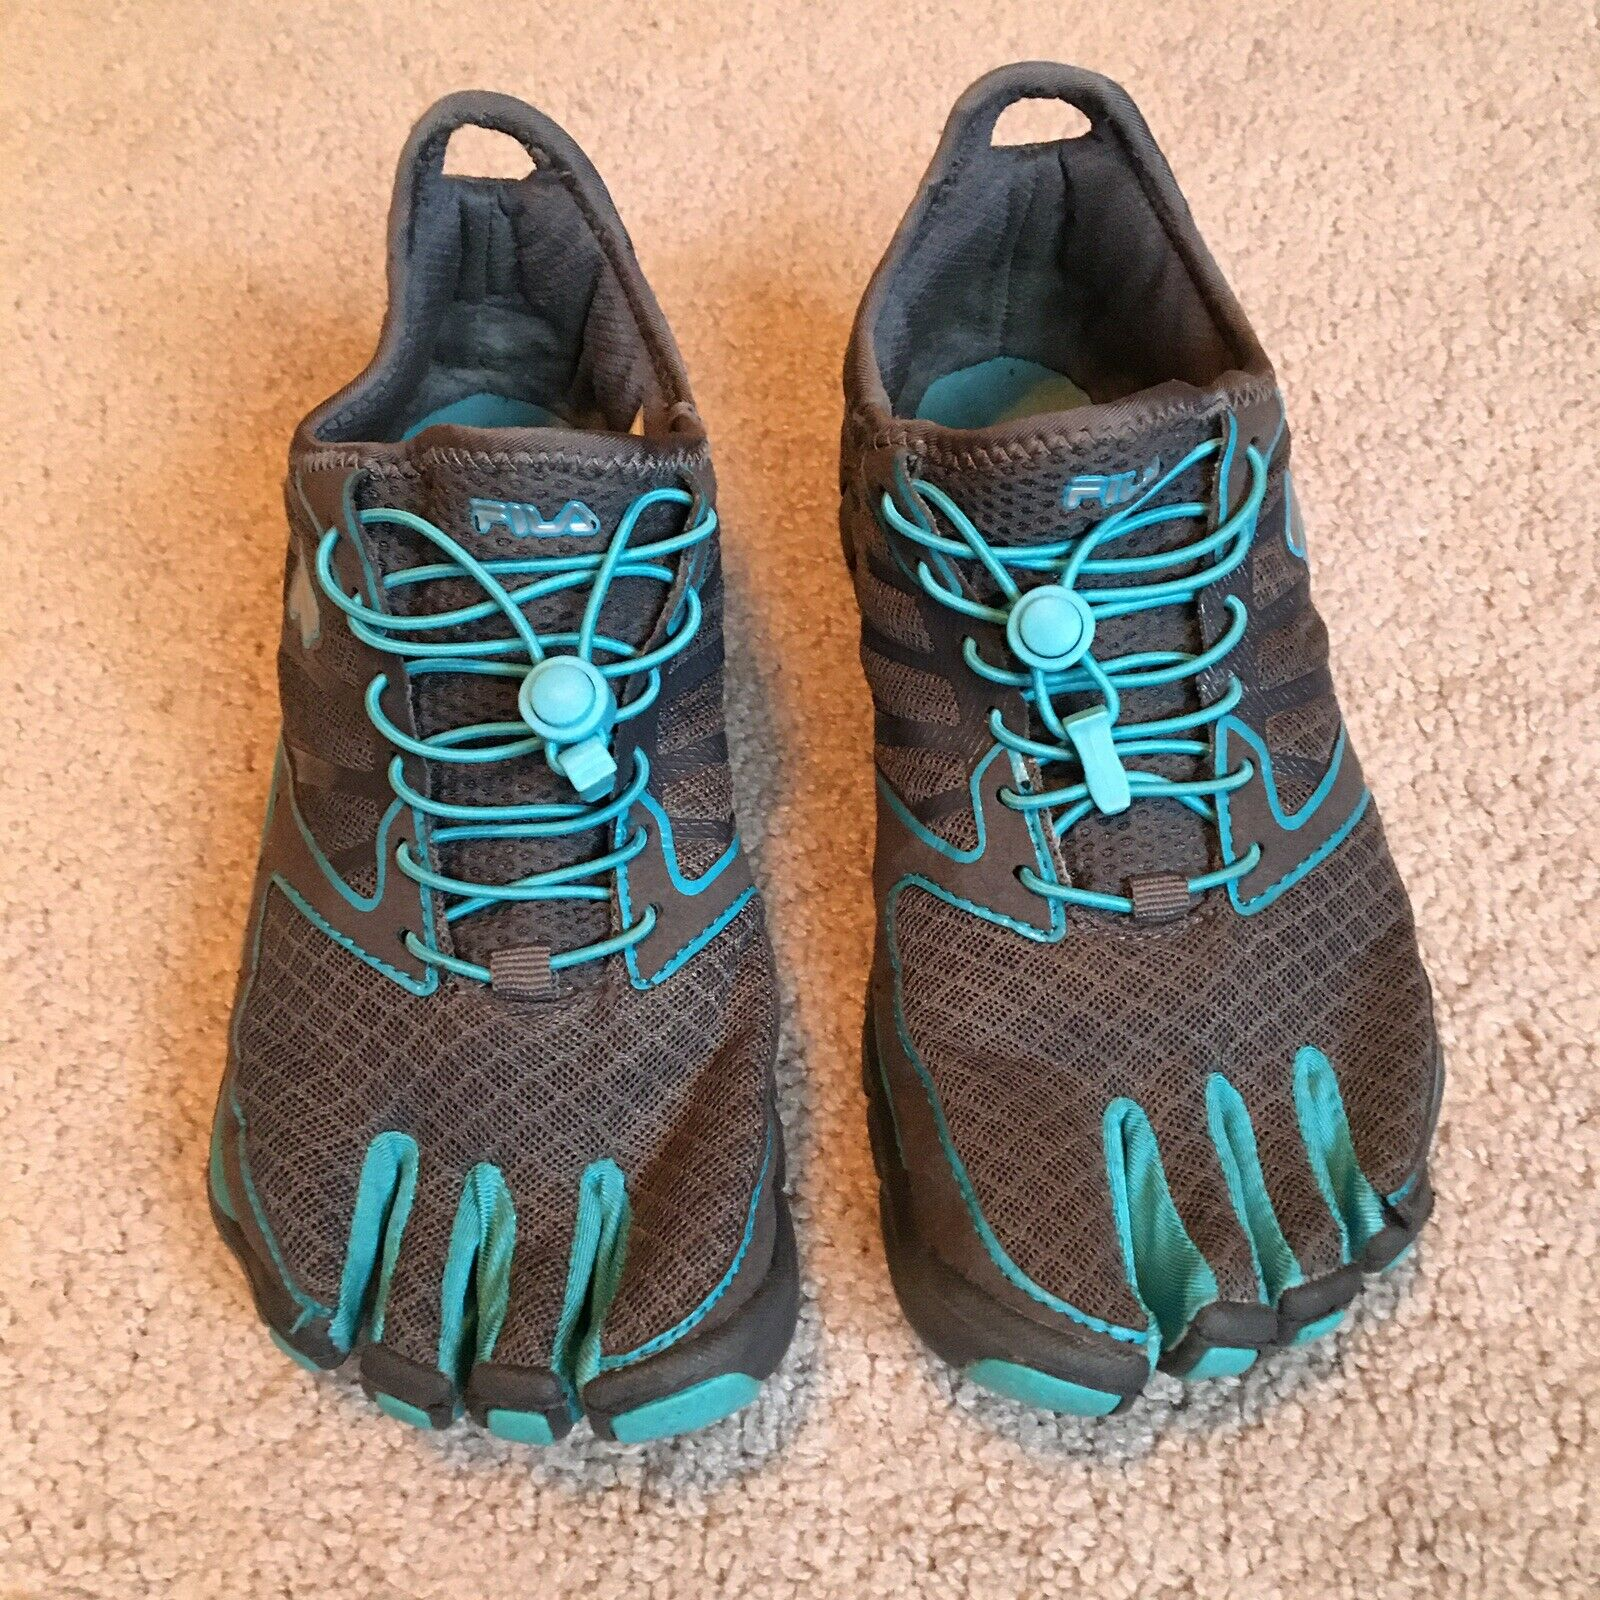 Fila Skele-Toes Athletic Bleu Gris Pour Femme Chaussures Taille 8